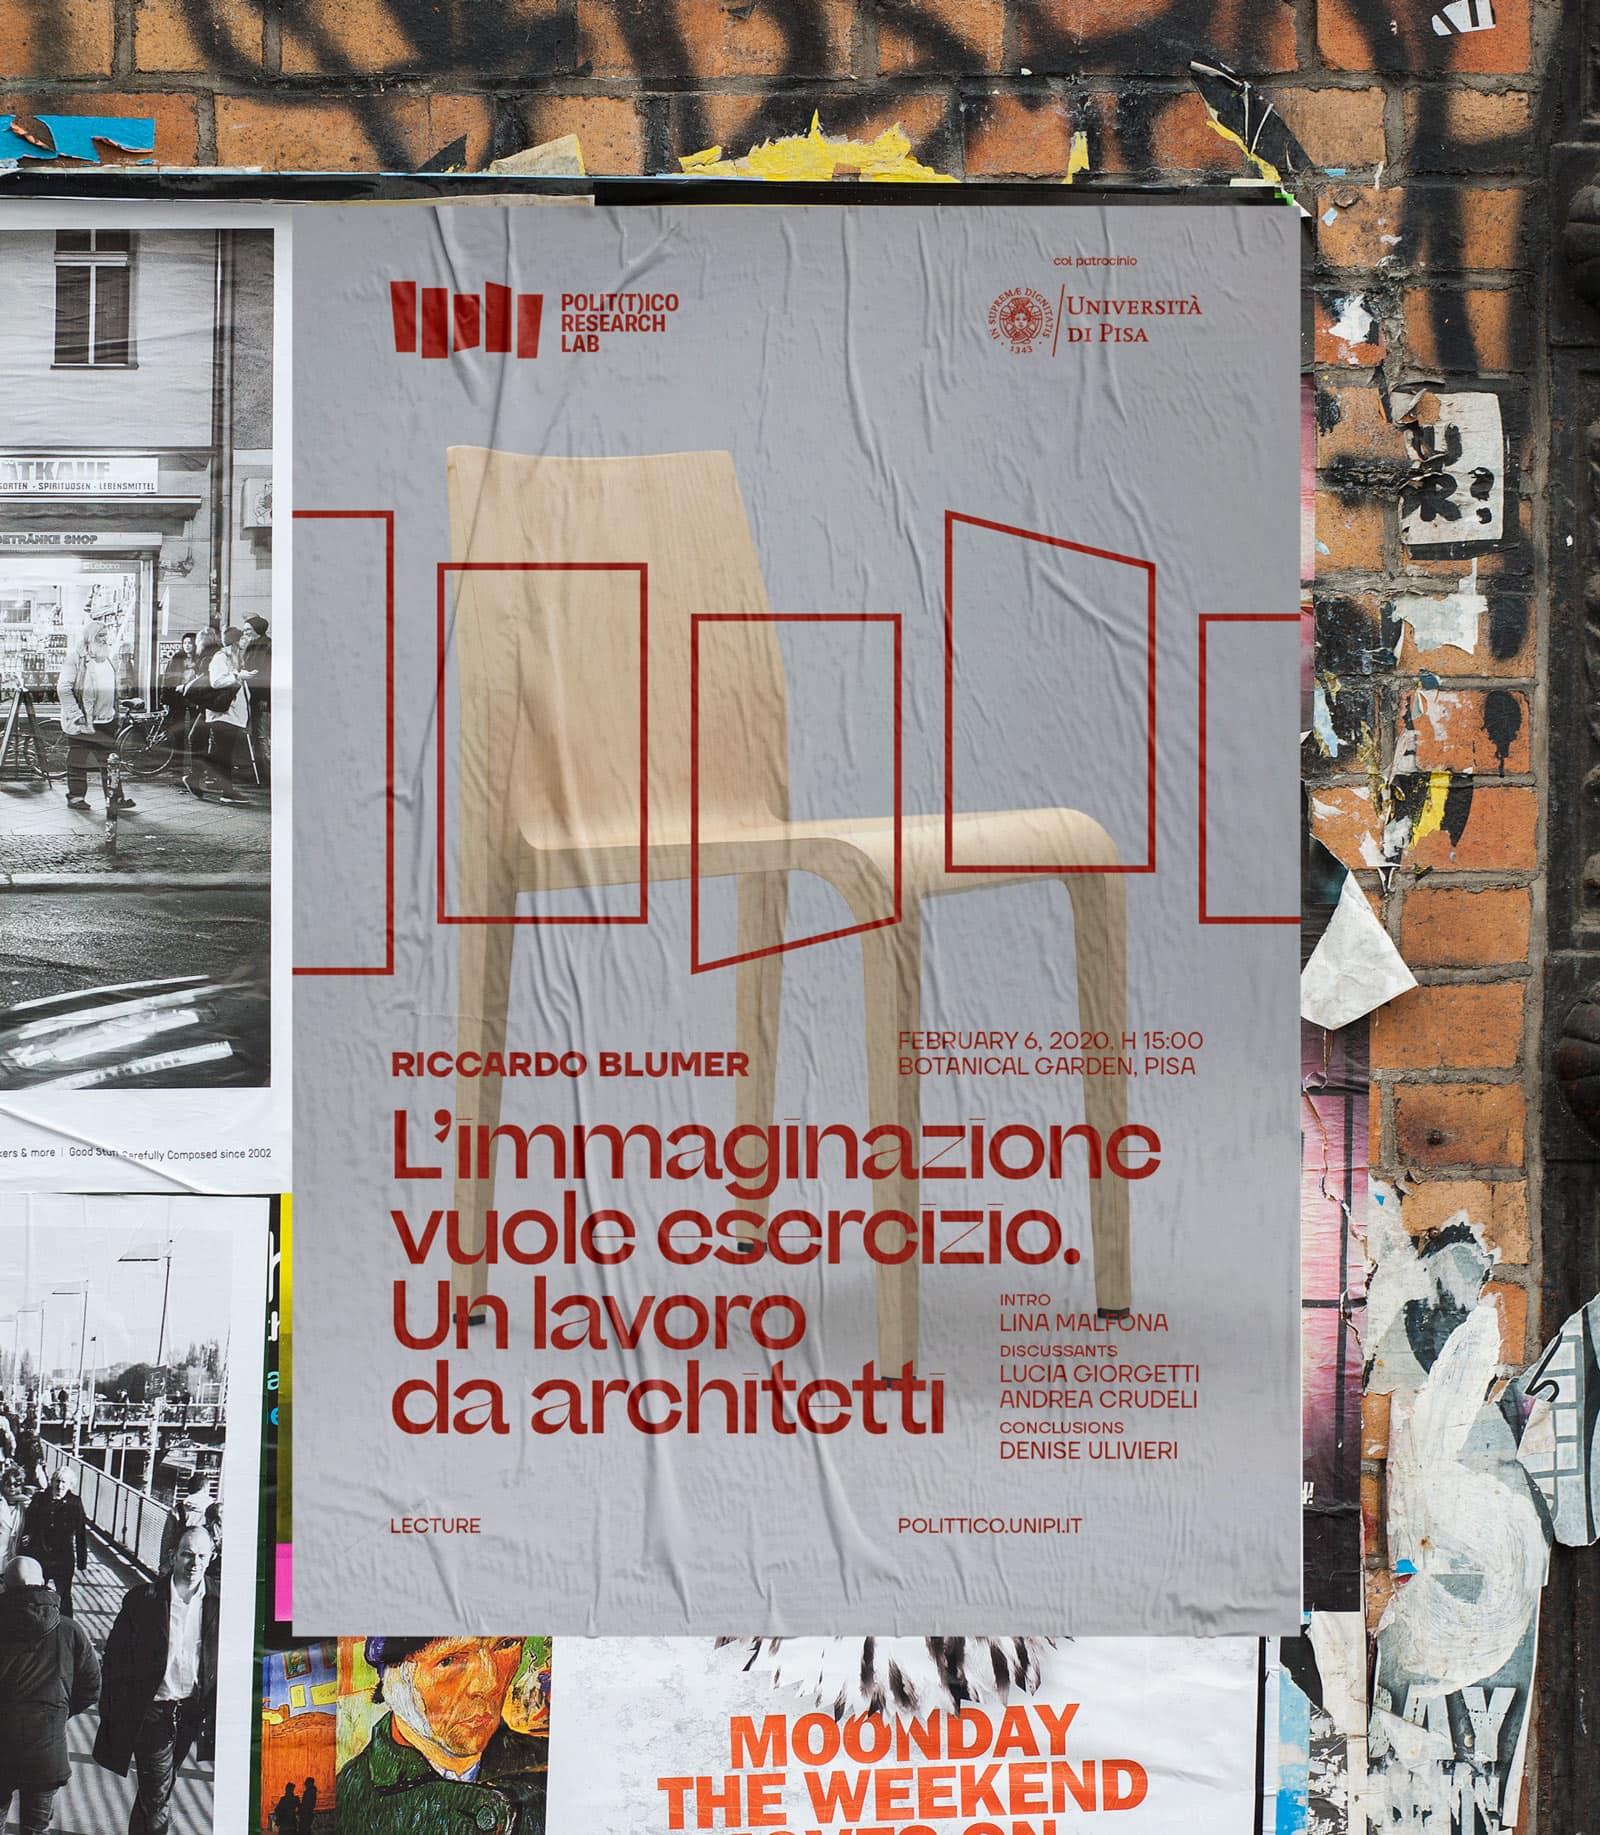 Polittico Research Lab poster / Riccardo Blumer